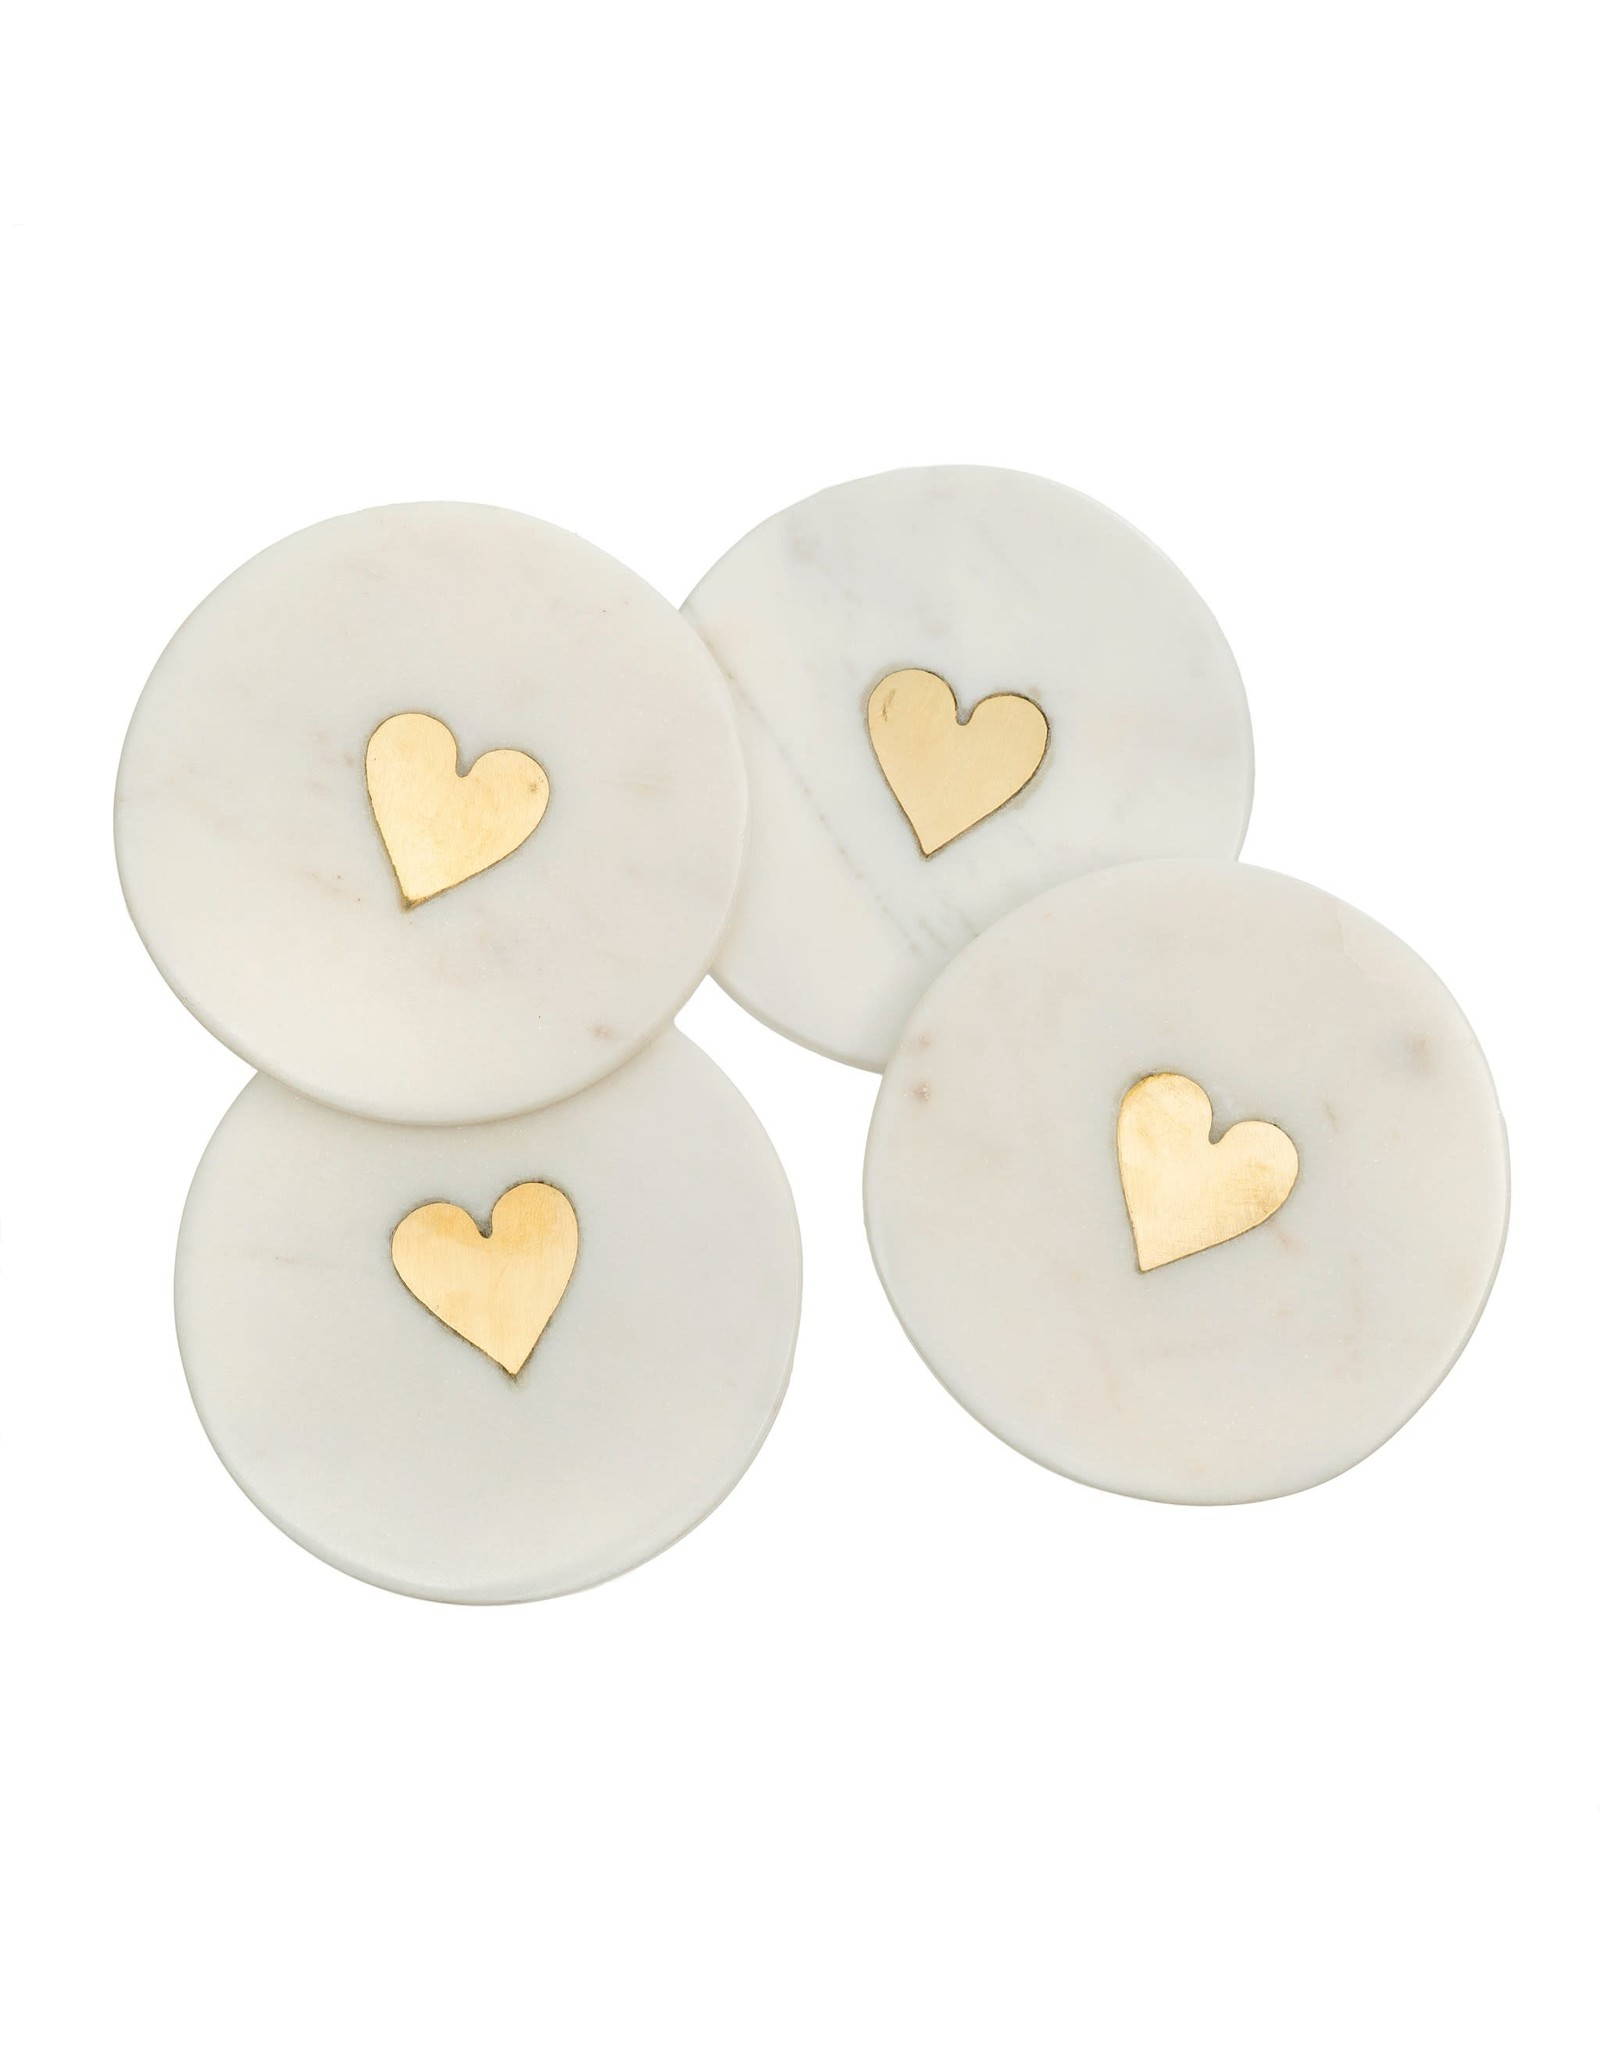 Sweet Heart Coasters S/4